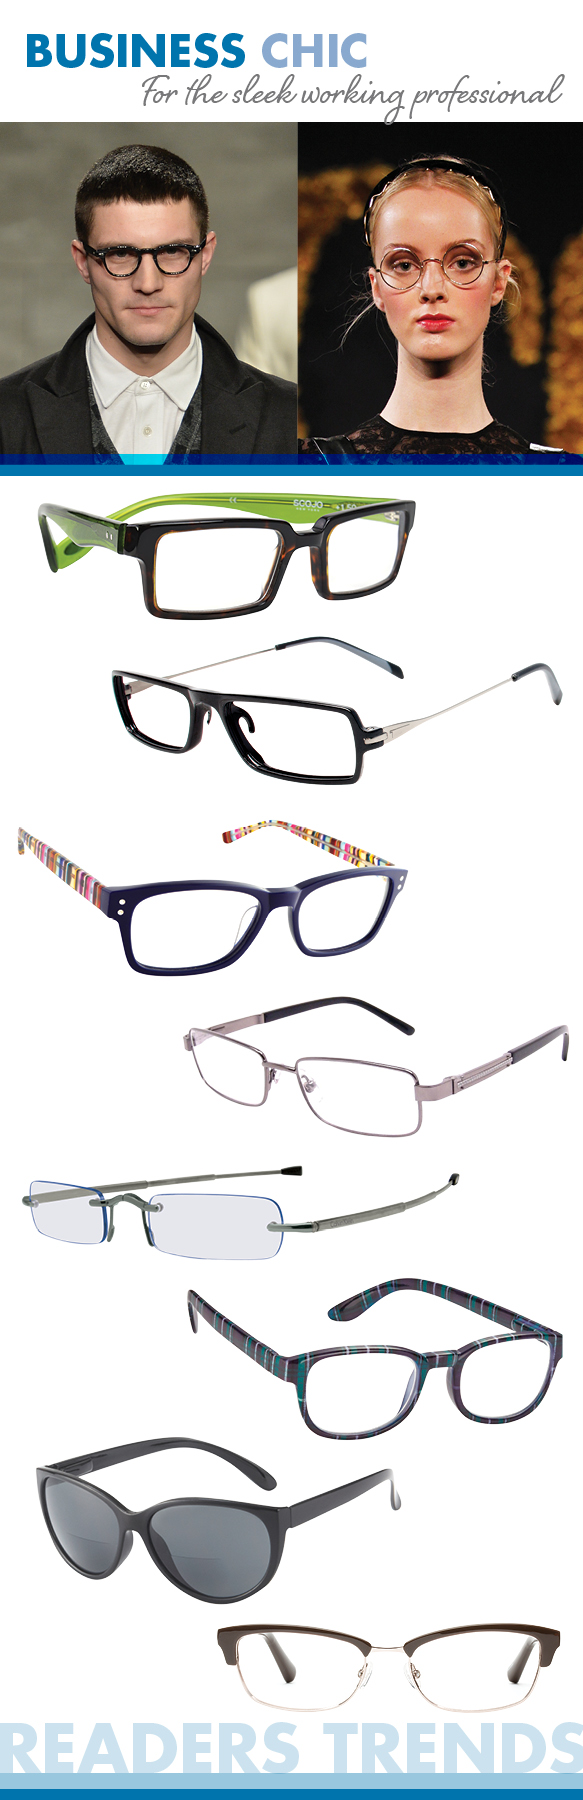 Ogi Eyewear (Montgomery Street), TUMI (Compatto), Corinne McCormack (Edie), Foster Grant (Jagger), Calvin Klein (Collapsible Readers), ICU Eyewear (7386), I Heart Eyewear (Adele), Bobbi Brown (The Village)